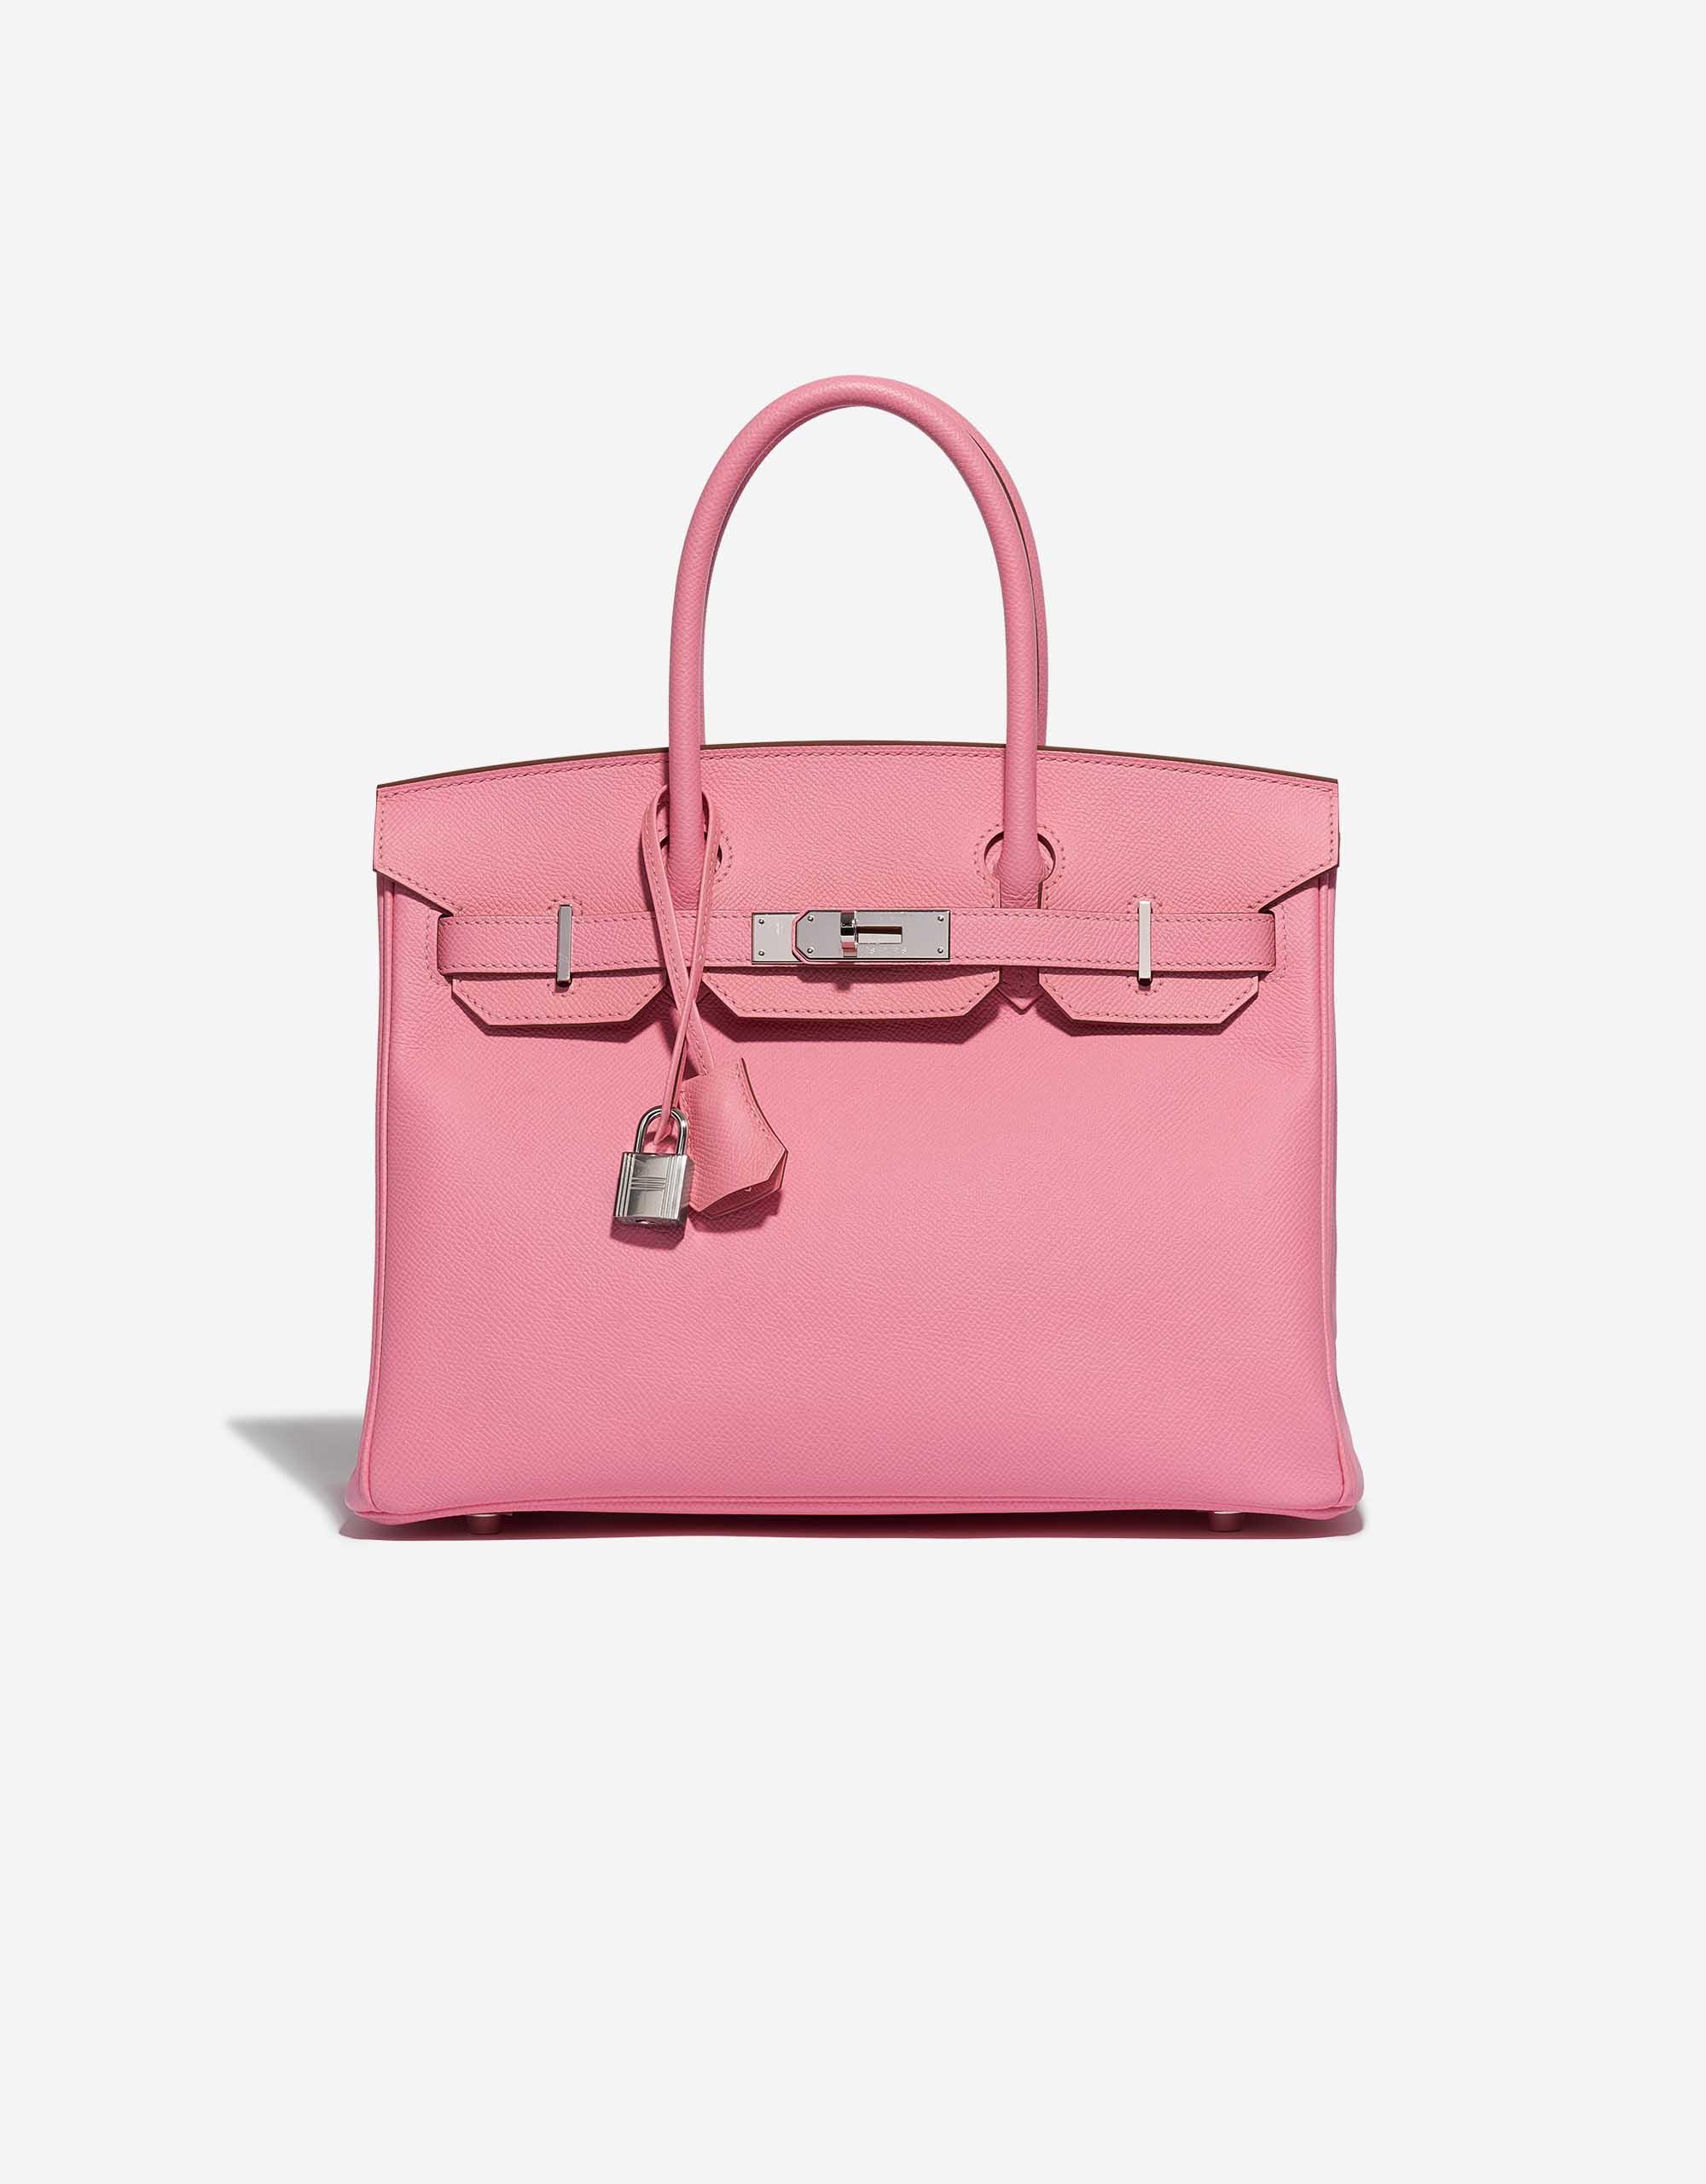 Hermès Birkin 30 Epsom Rose Confetti | SACLÀB